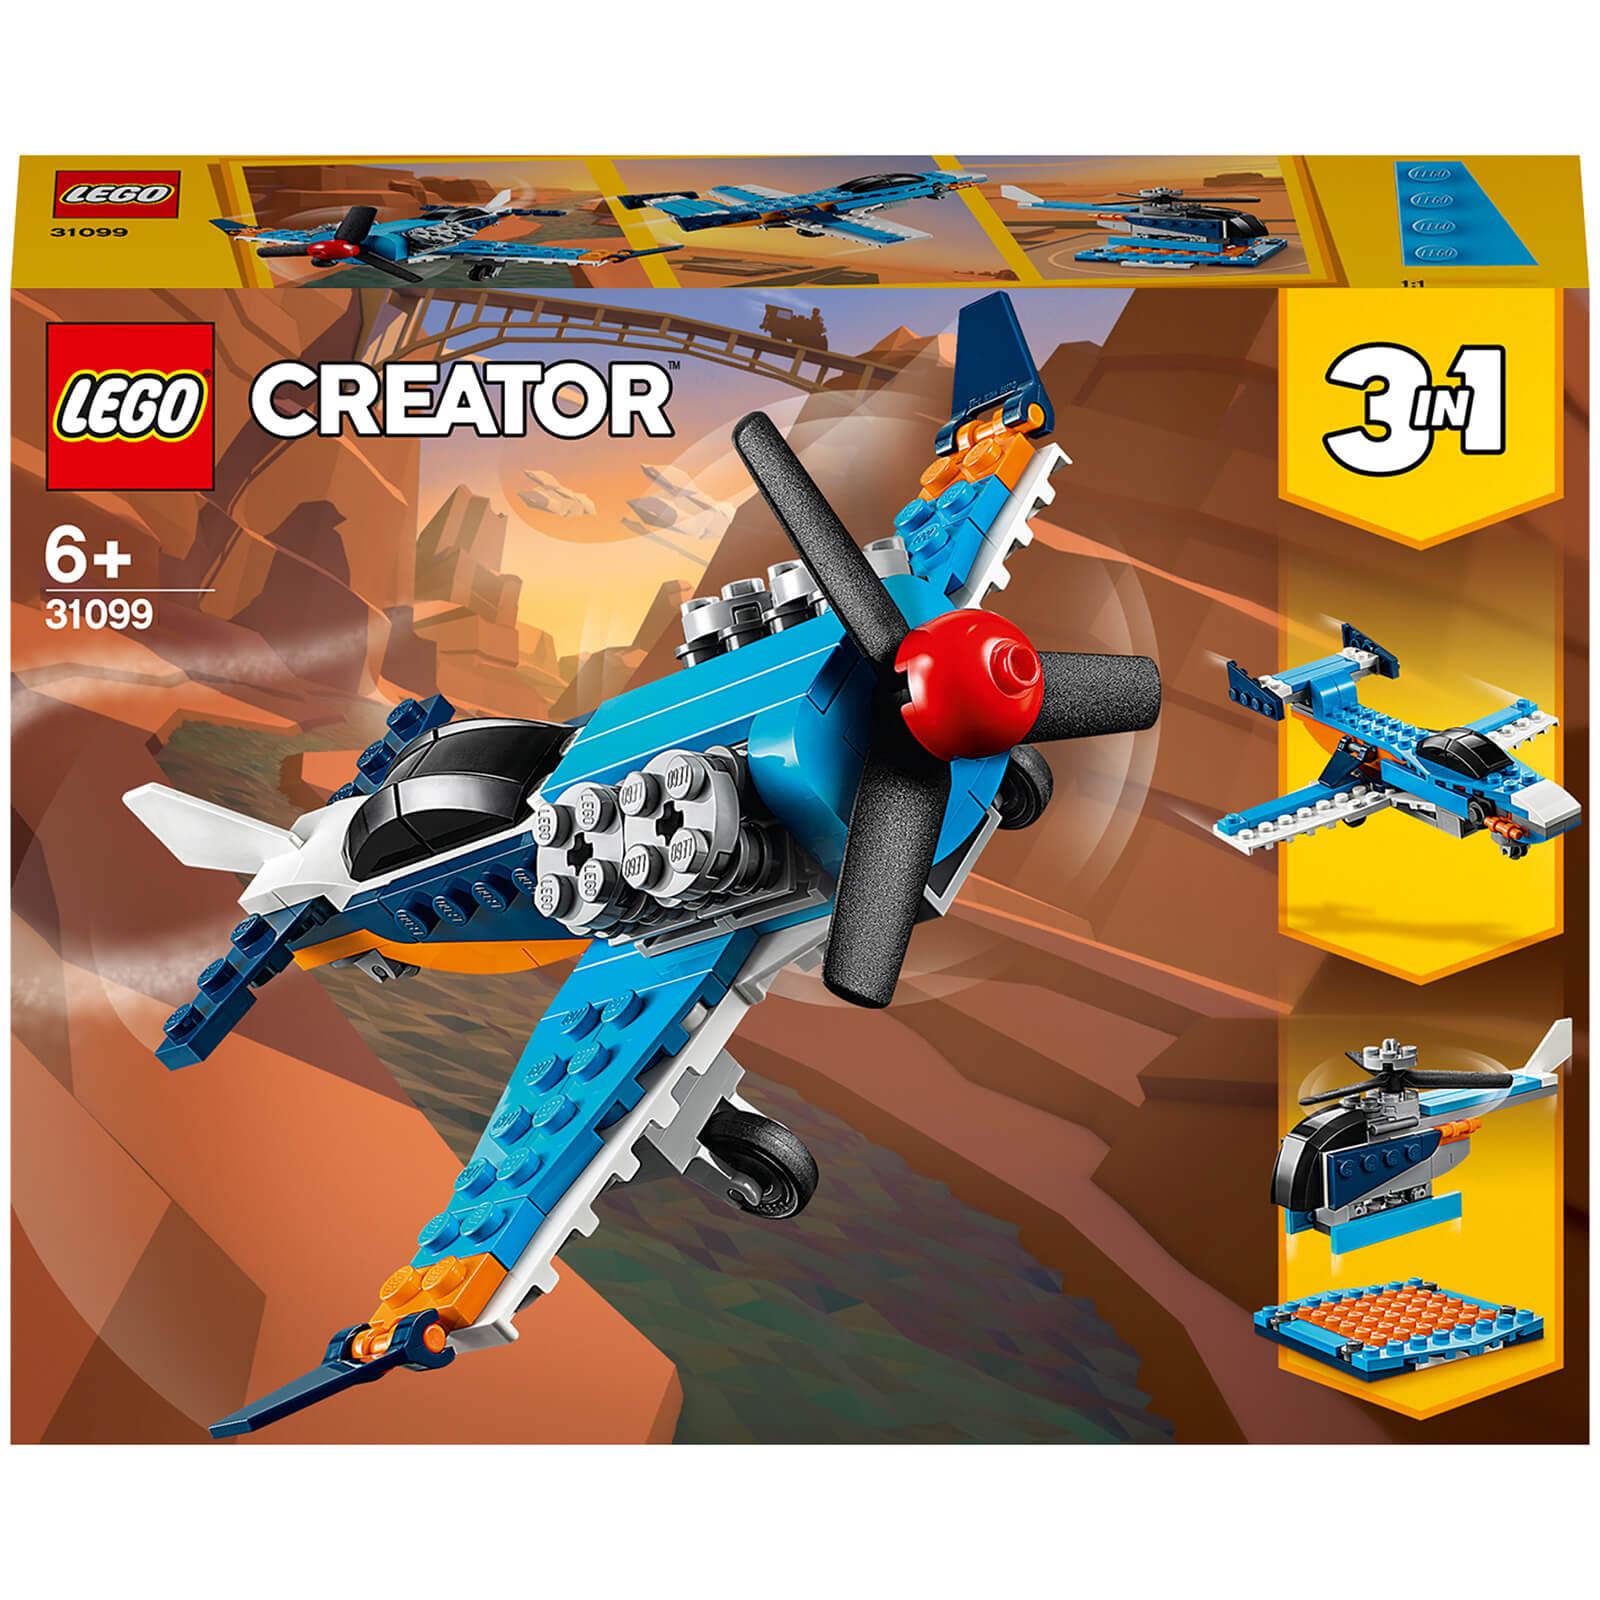 Image of Lego Creator Propeller Plane